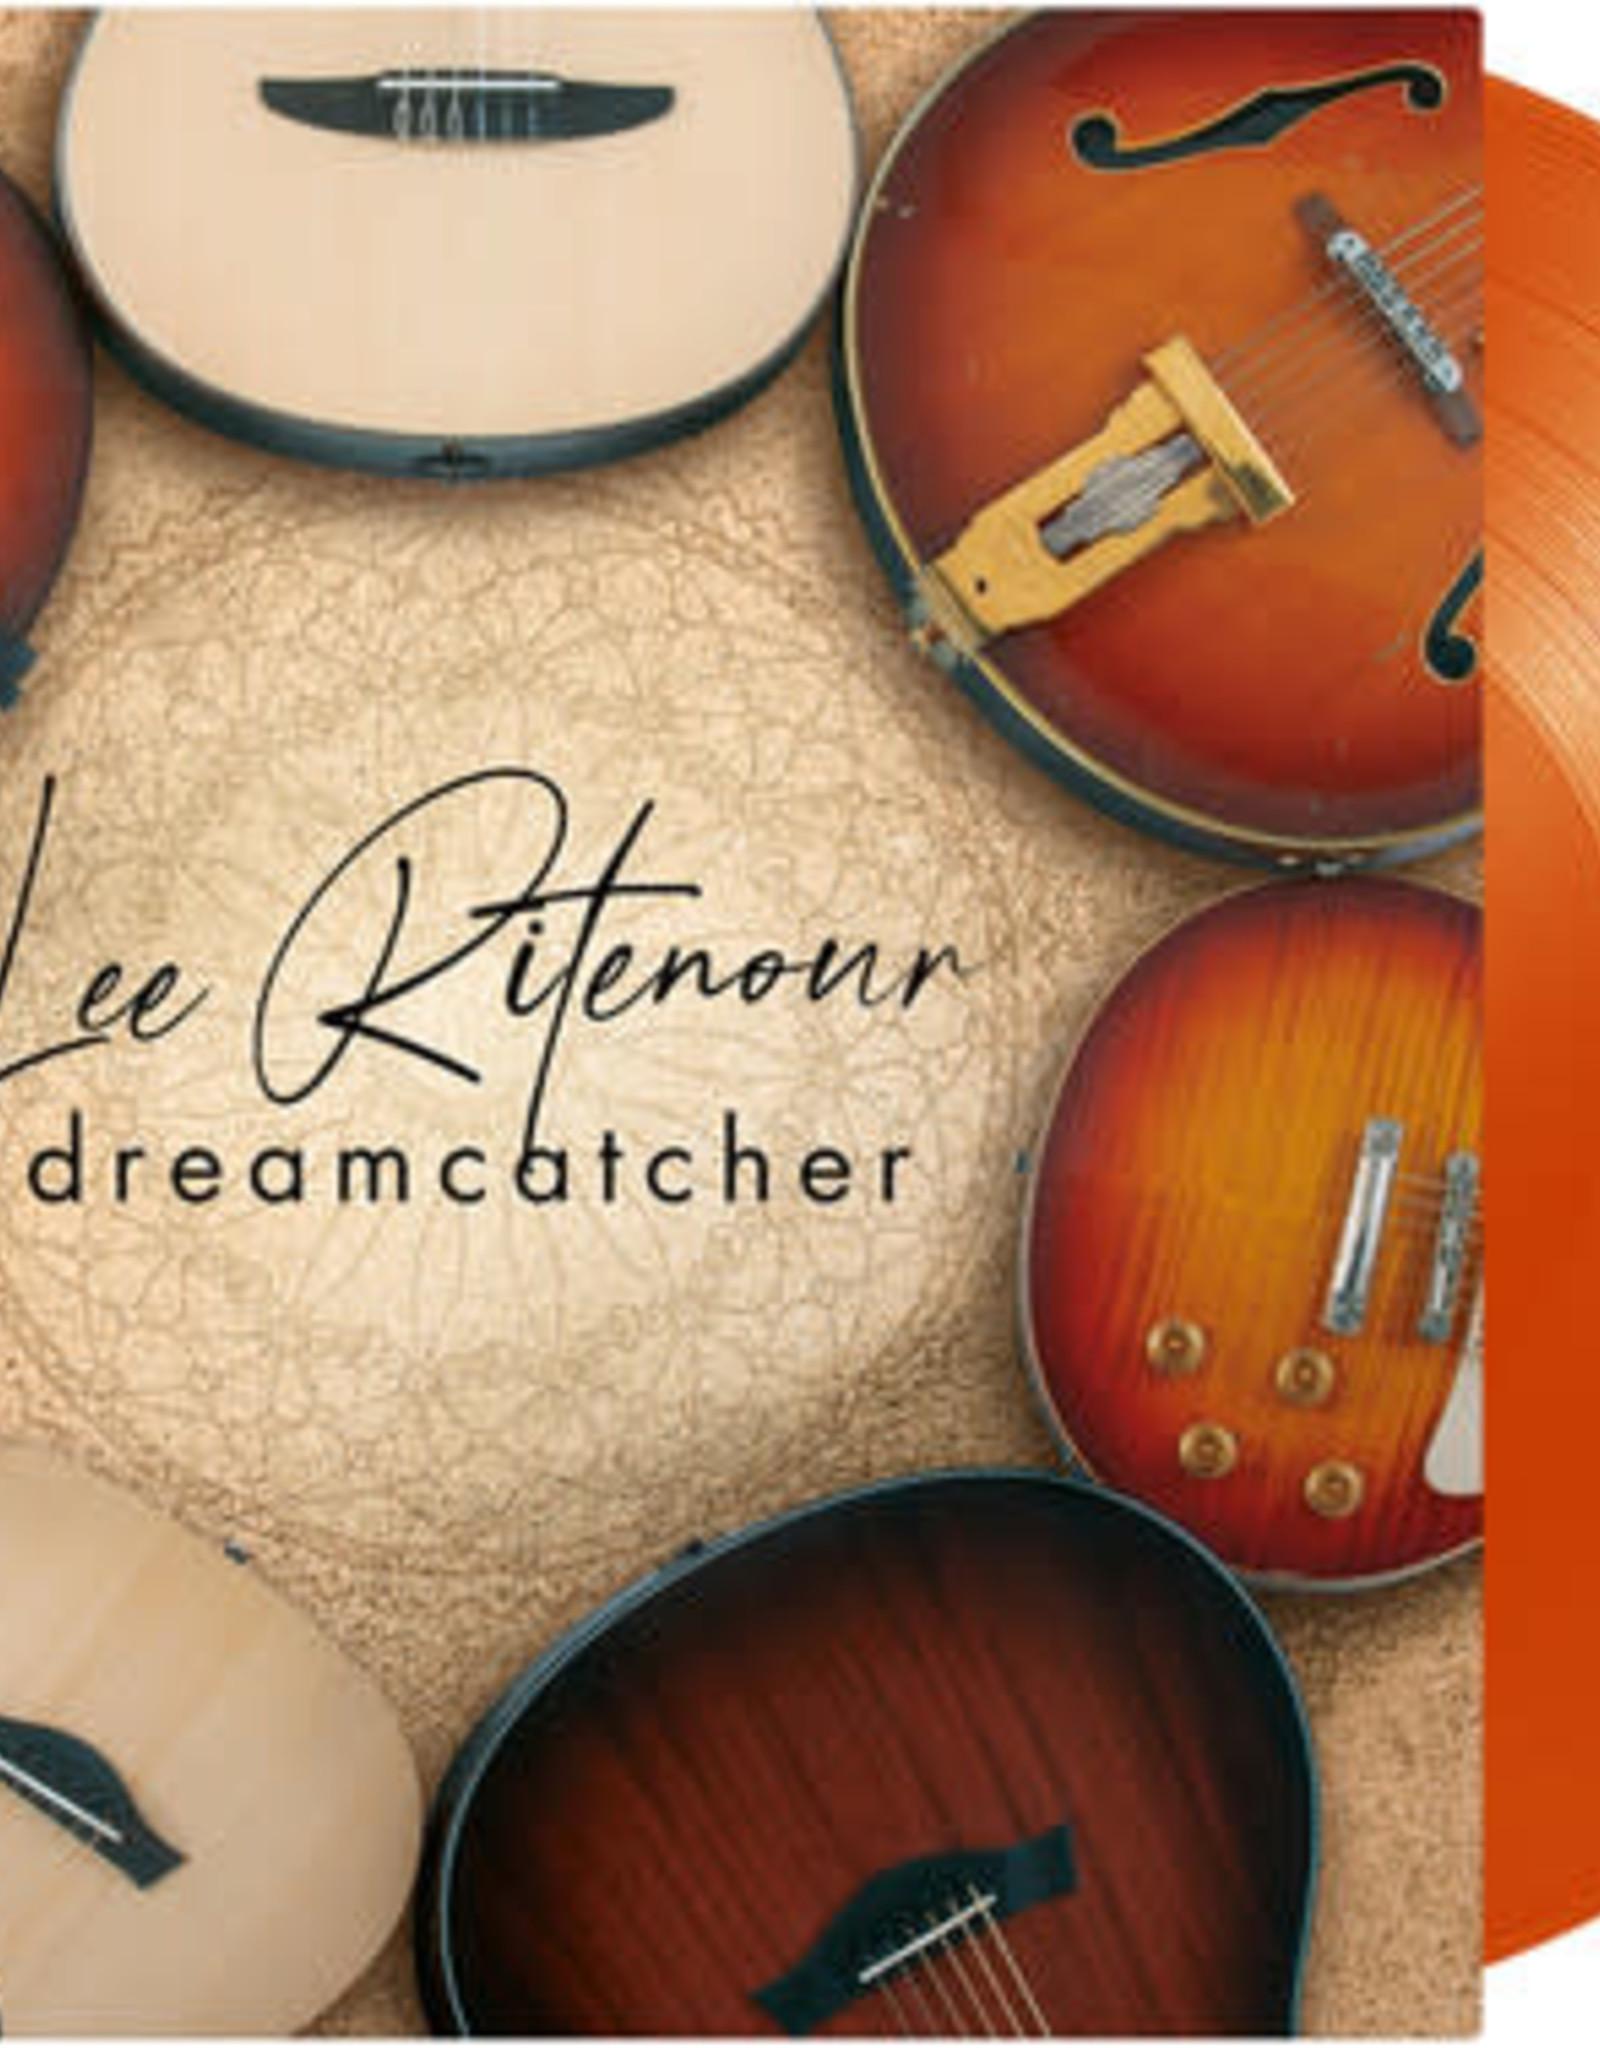 Lee Ritenour - Dreamcatcher (Orange Vinyl)